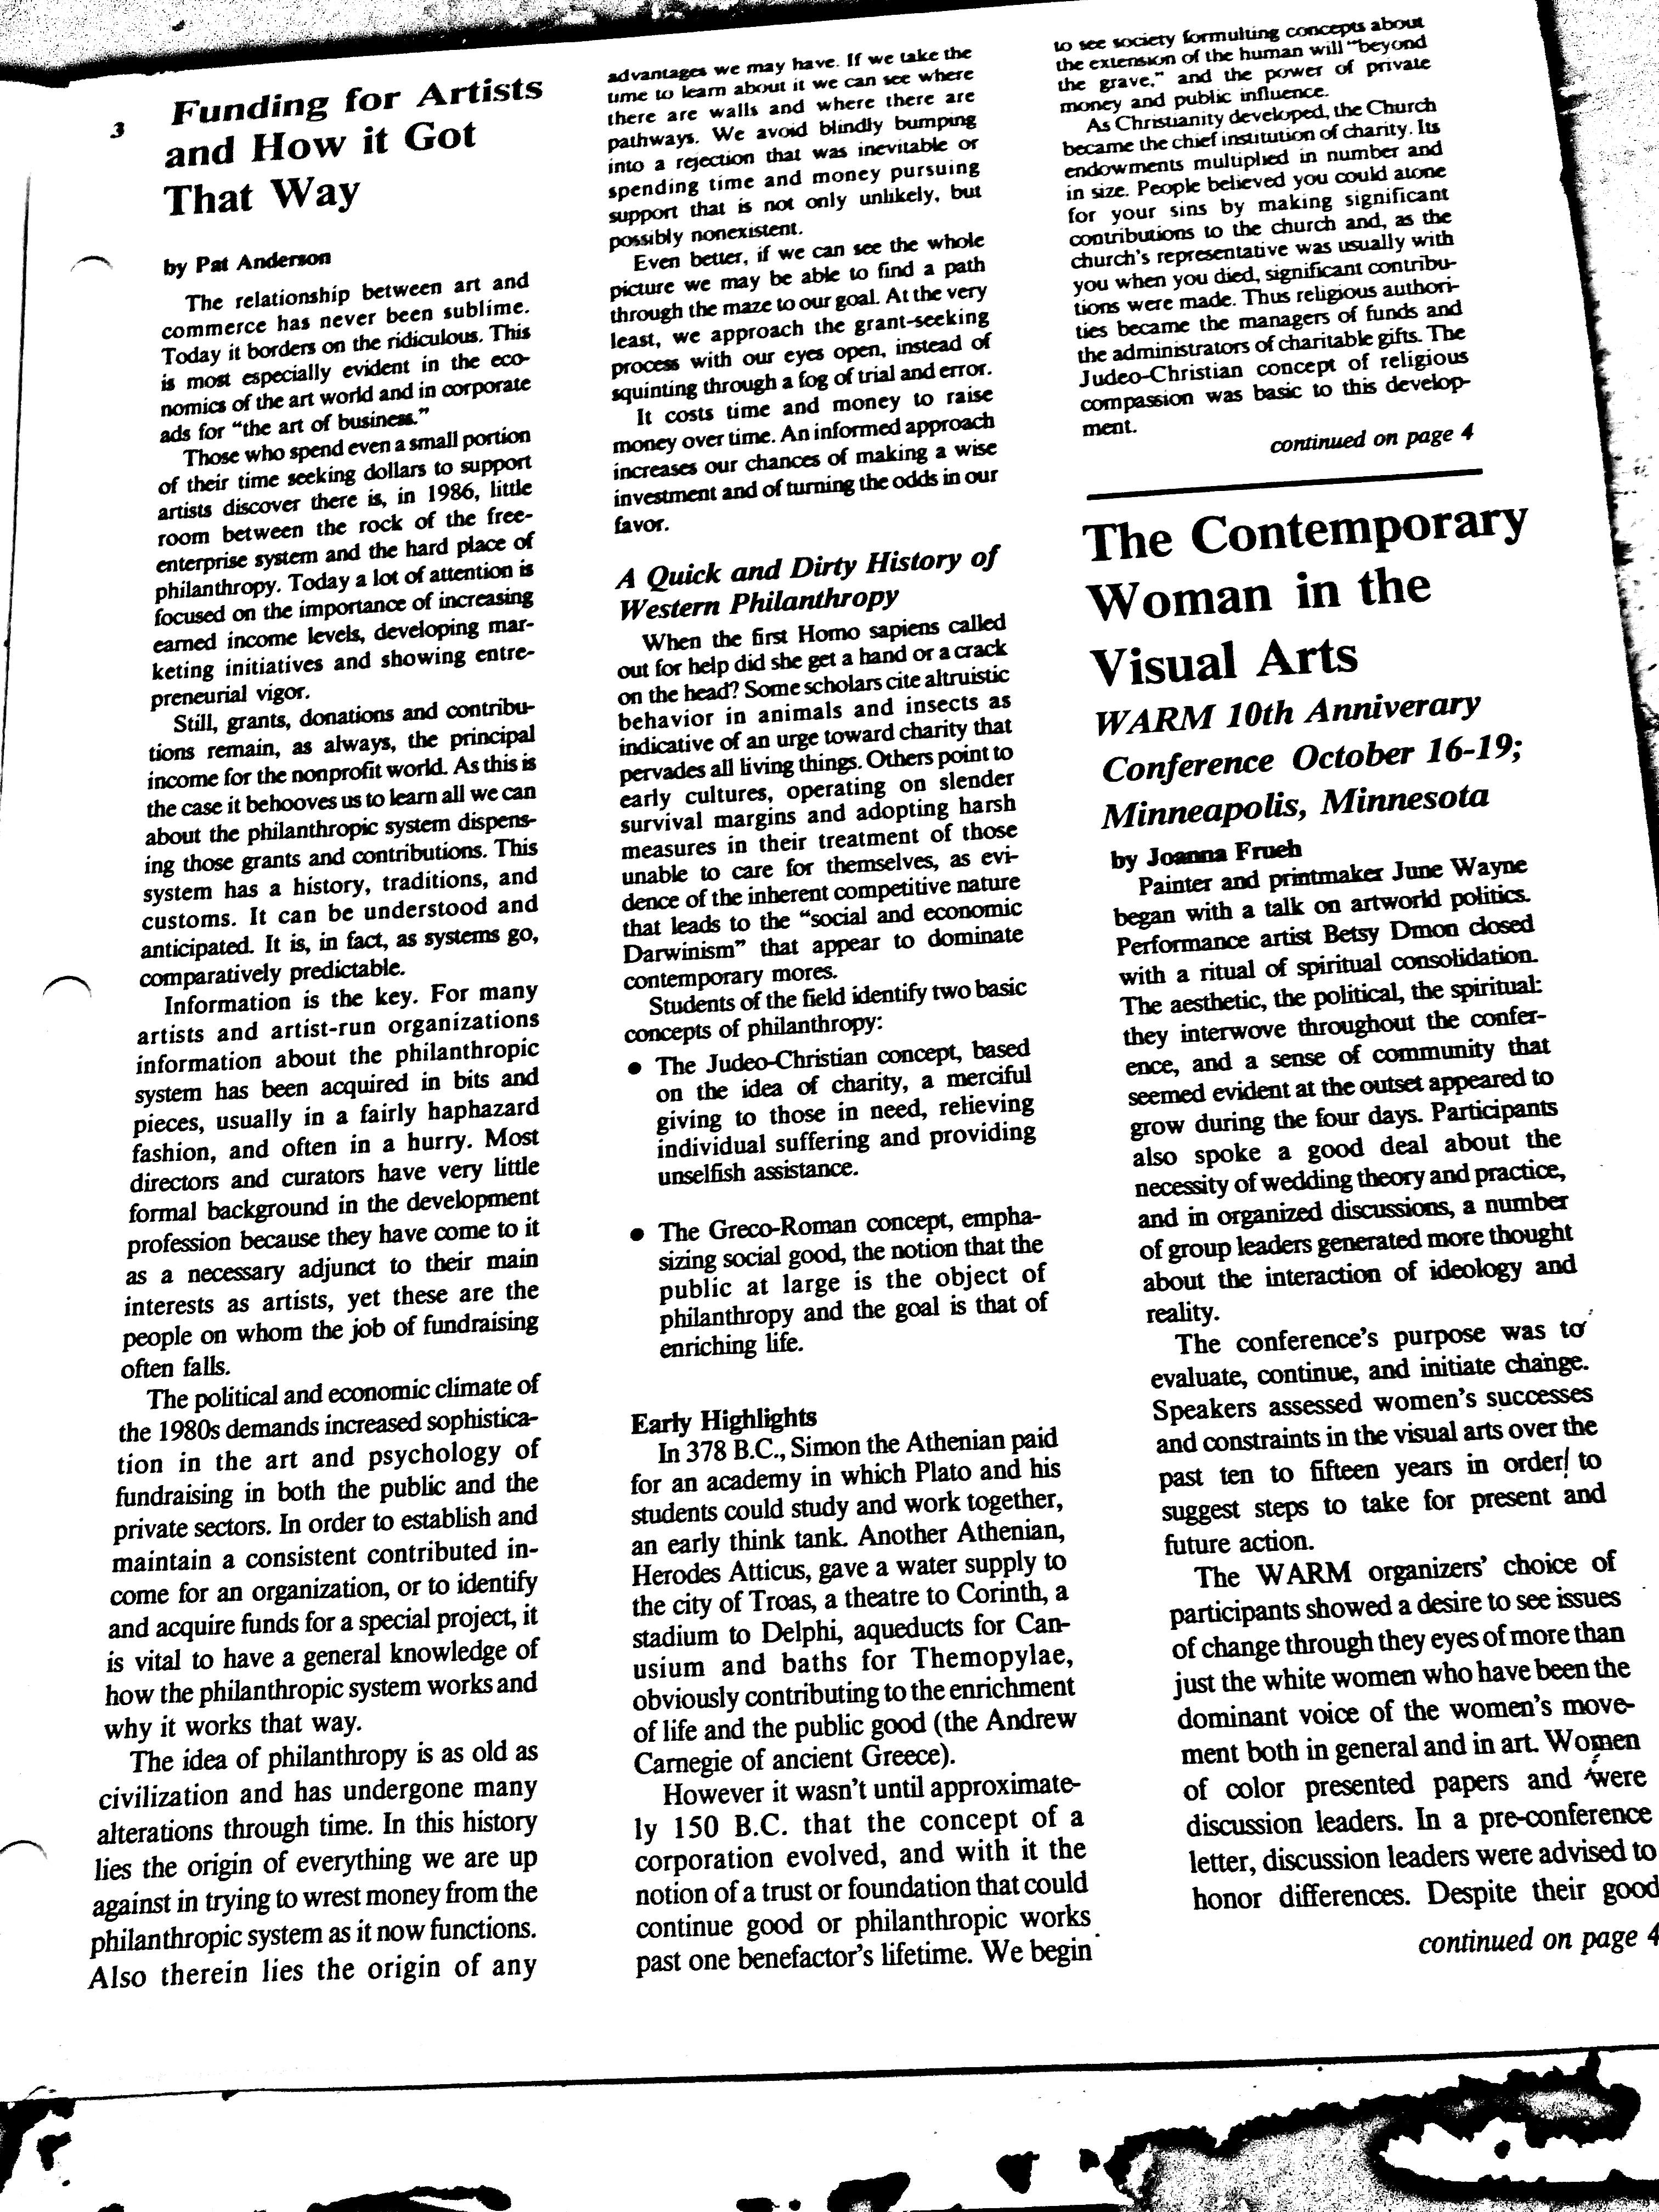 November-December 1986 - NAAO Bulletin Page 3 (1).jpg